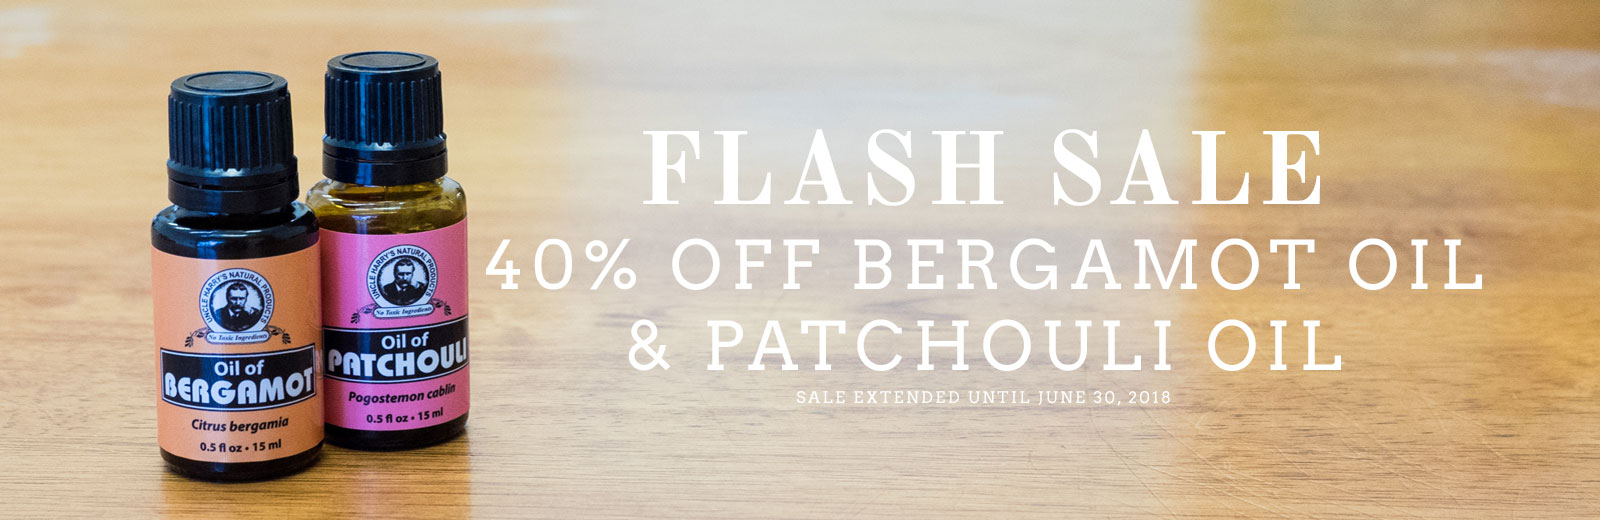 Bergamot & Patchouli Sale - 40% off - Extended!